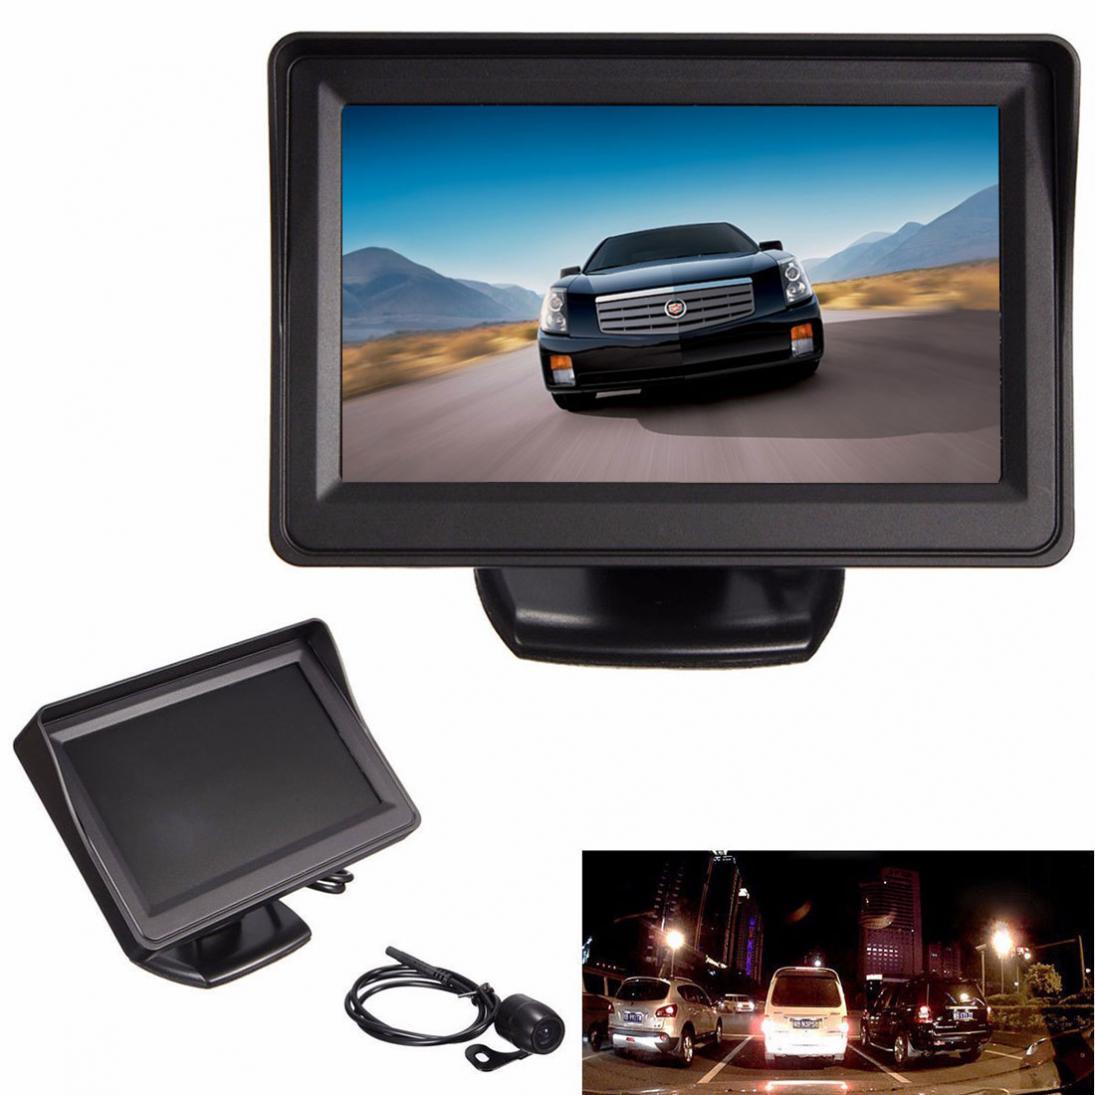 4.3 Inch Car Auto Rear View Monitor Reversing Color LCD TFT Display Car monitor Waterproof Vehicle Backup Rearview camera